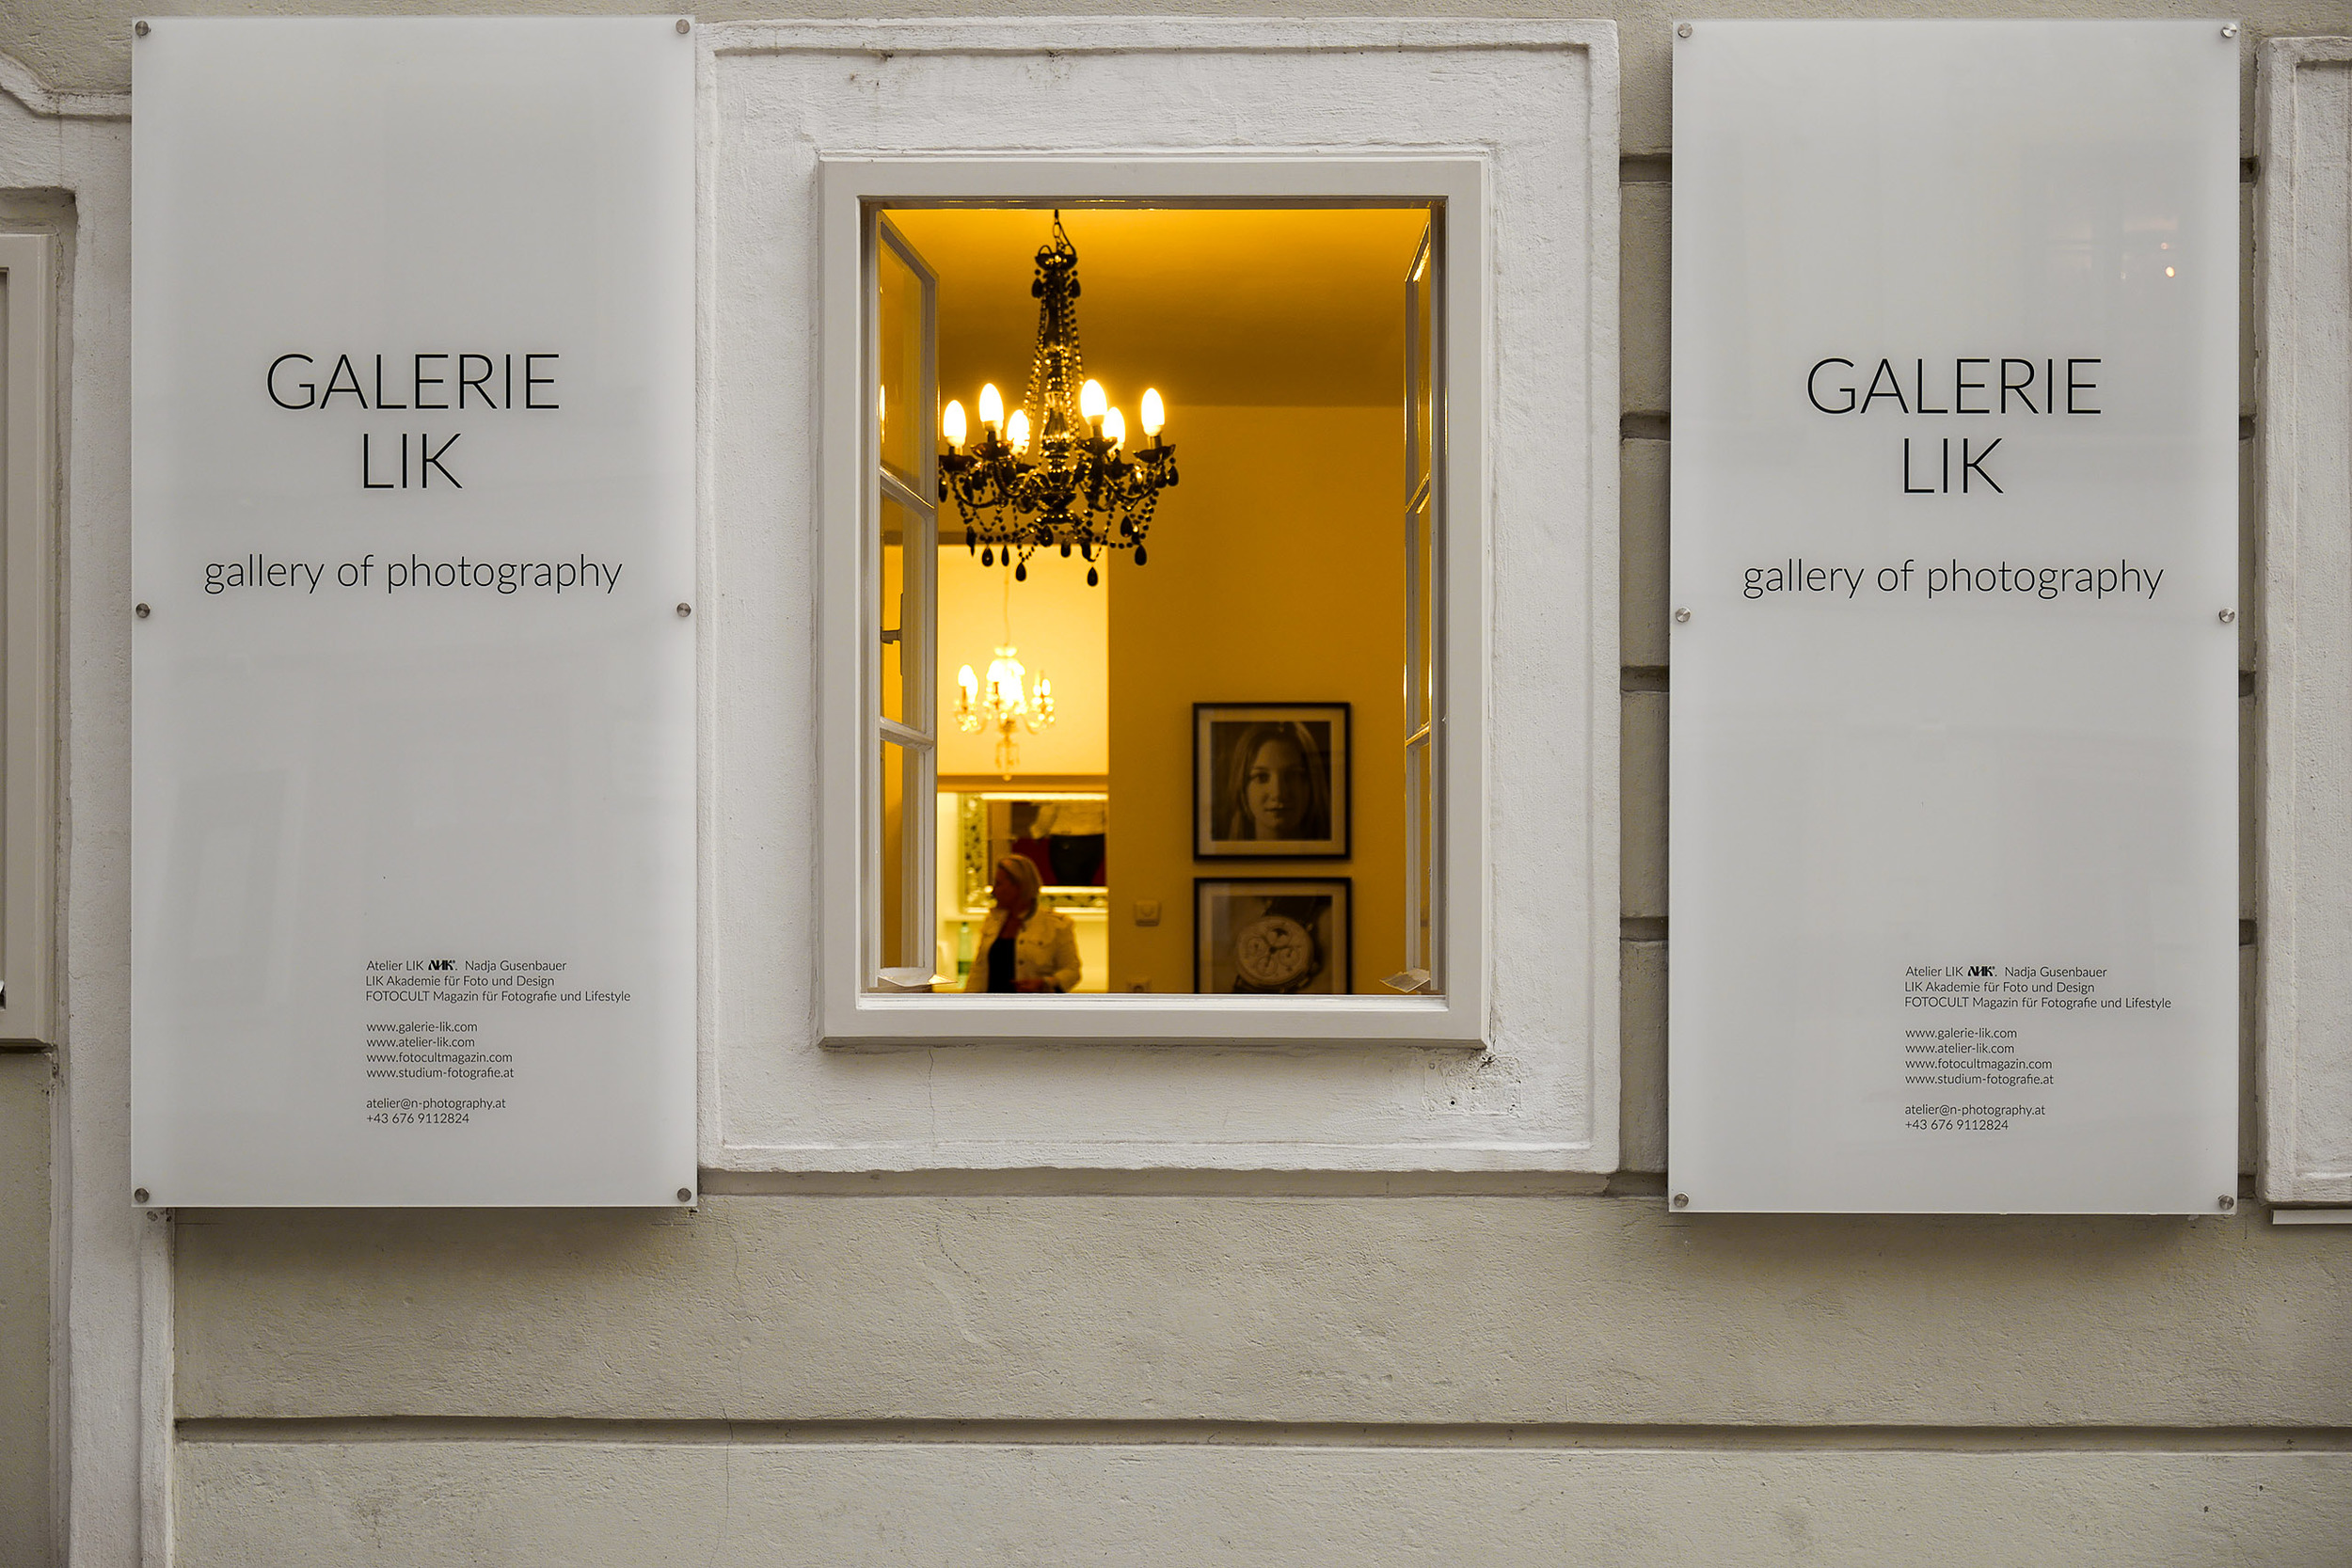 Galerie LIK am Spittelberg Wien